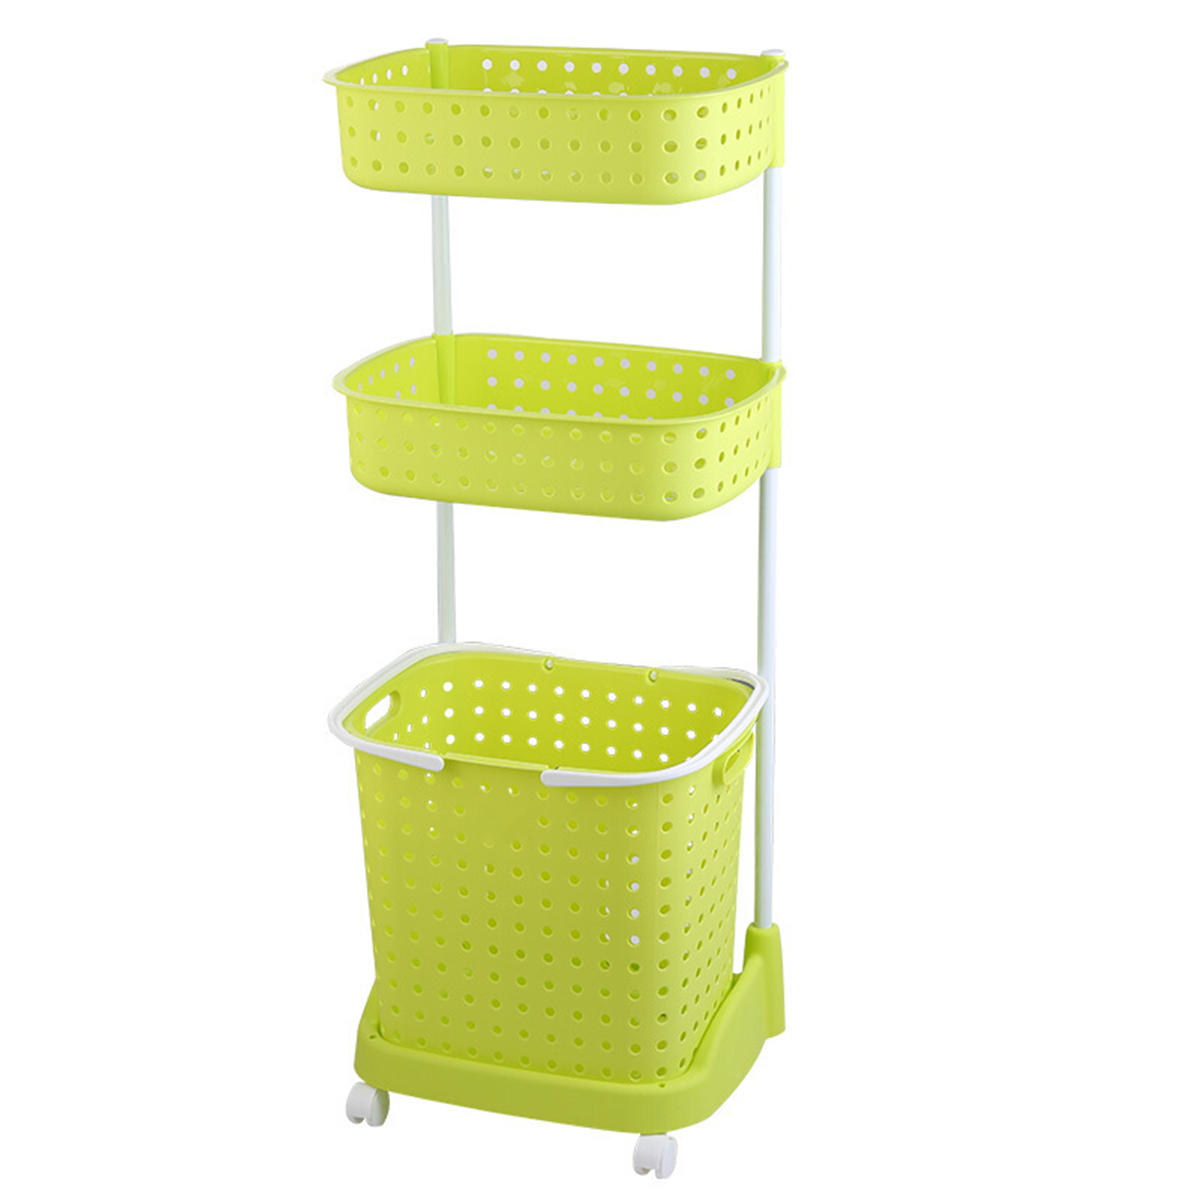 Bathroom Laundry Clothes Storage Baskets Bin Hamper Mobile Rack Removable Shelf 23 Tier with measurements 1200 X 1200